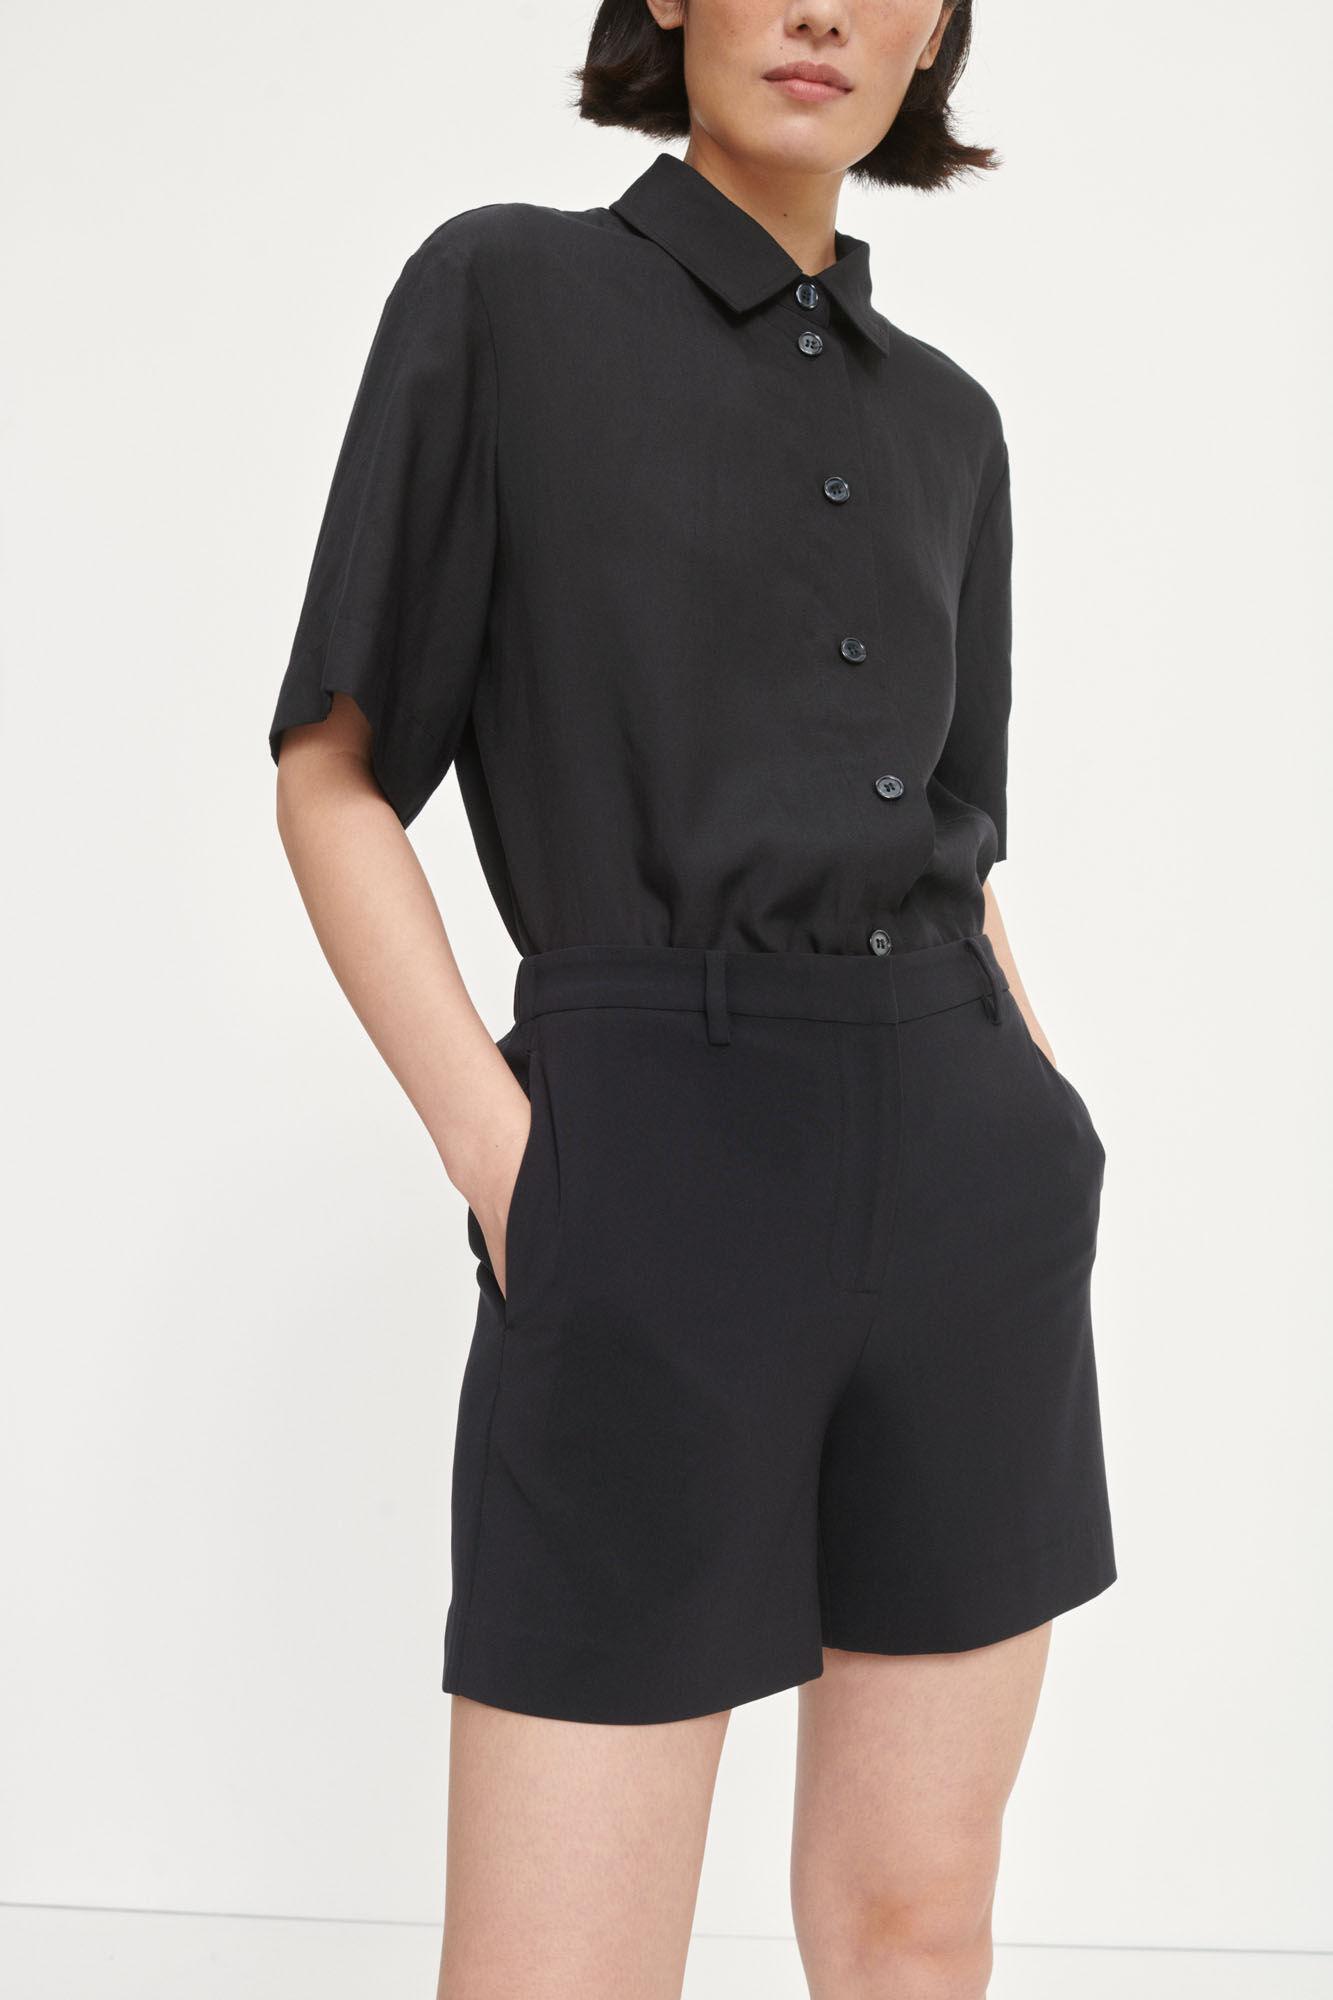 Hoys Shorts Pants Black-1